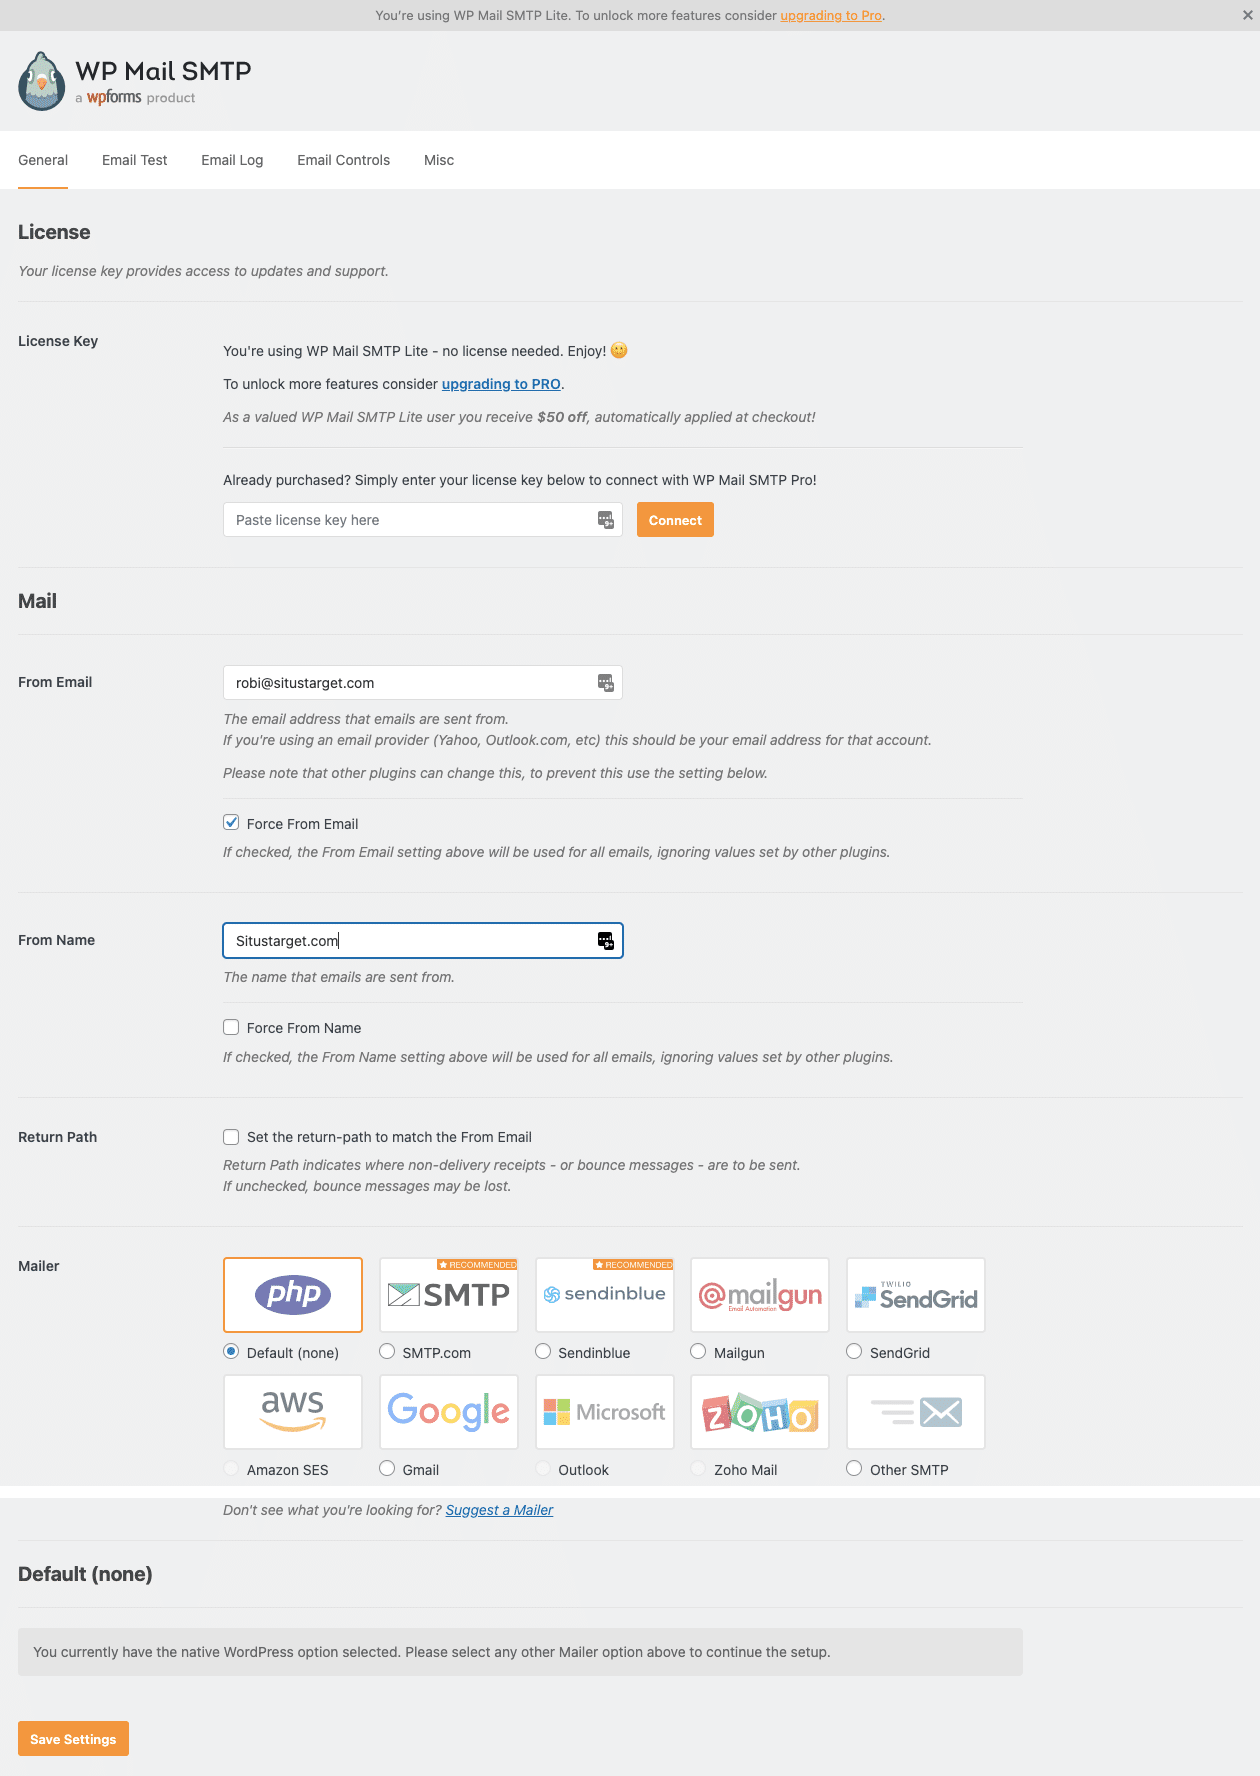 Pengaturan Pada Plugin SMTP di WordPress